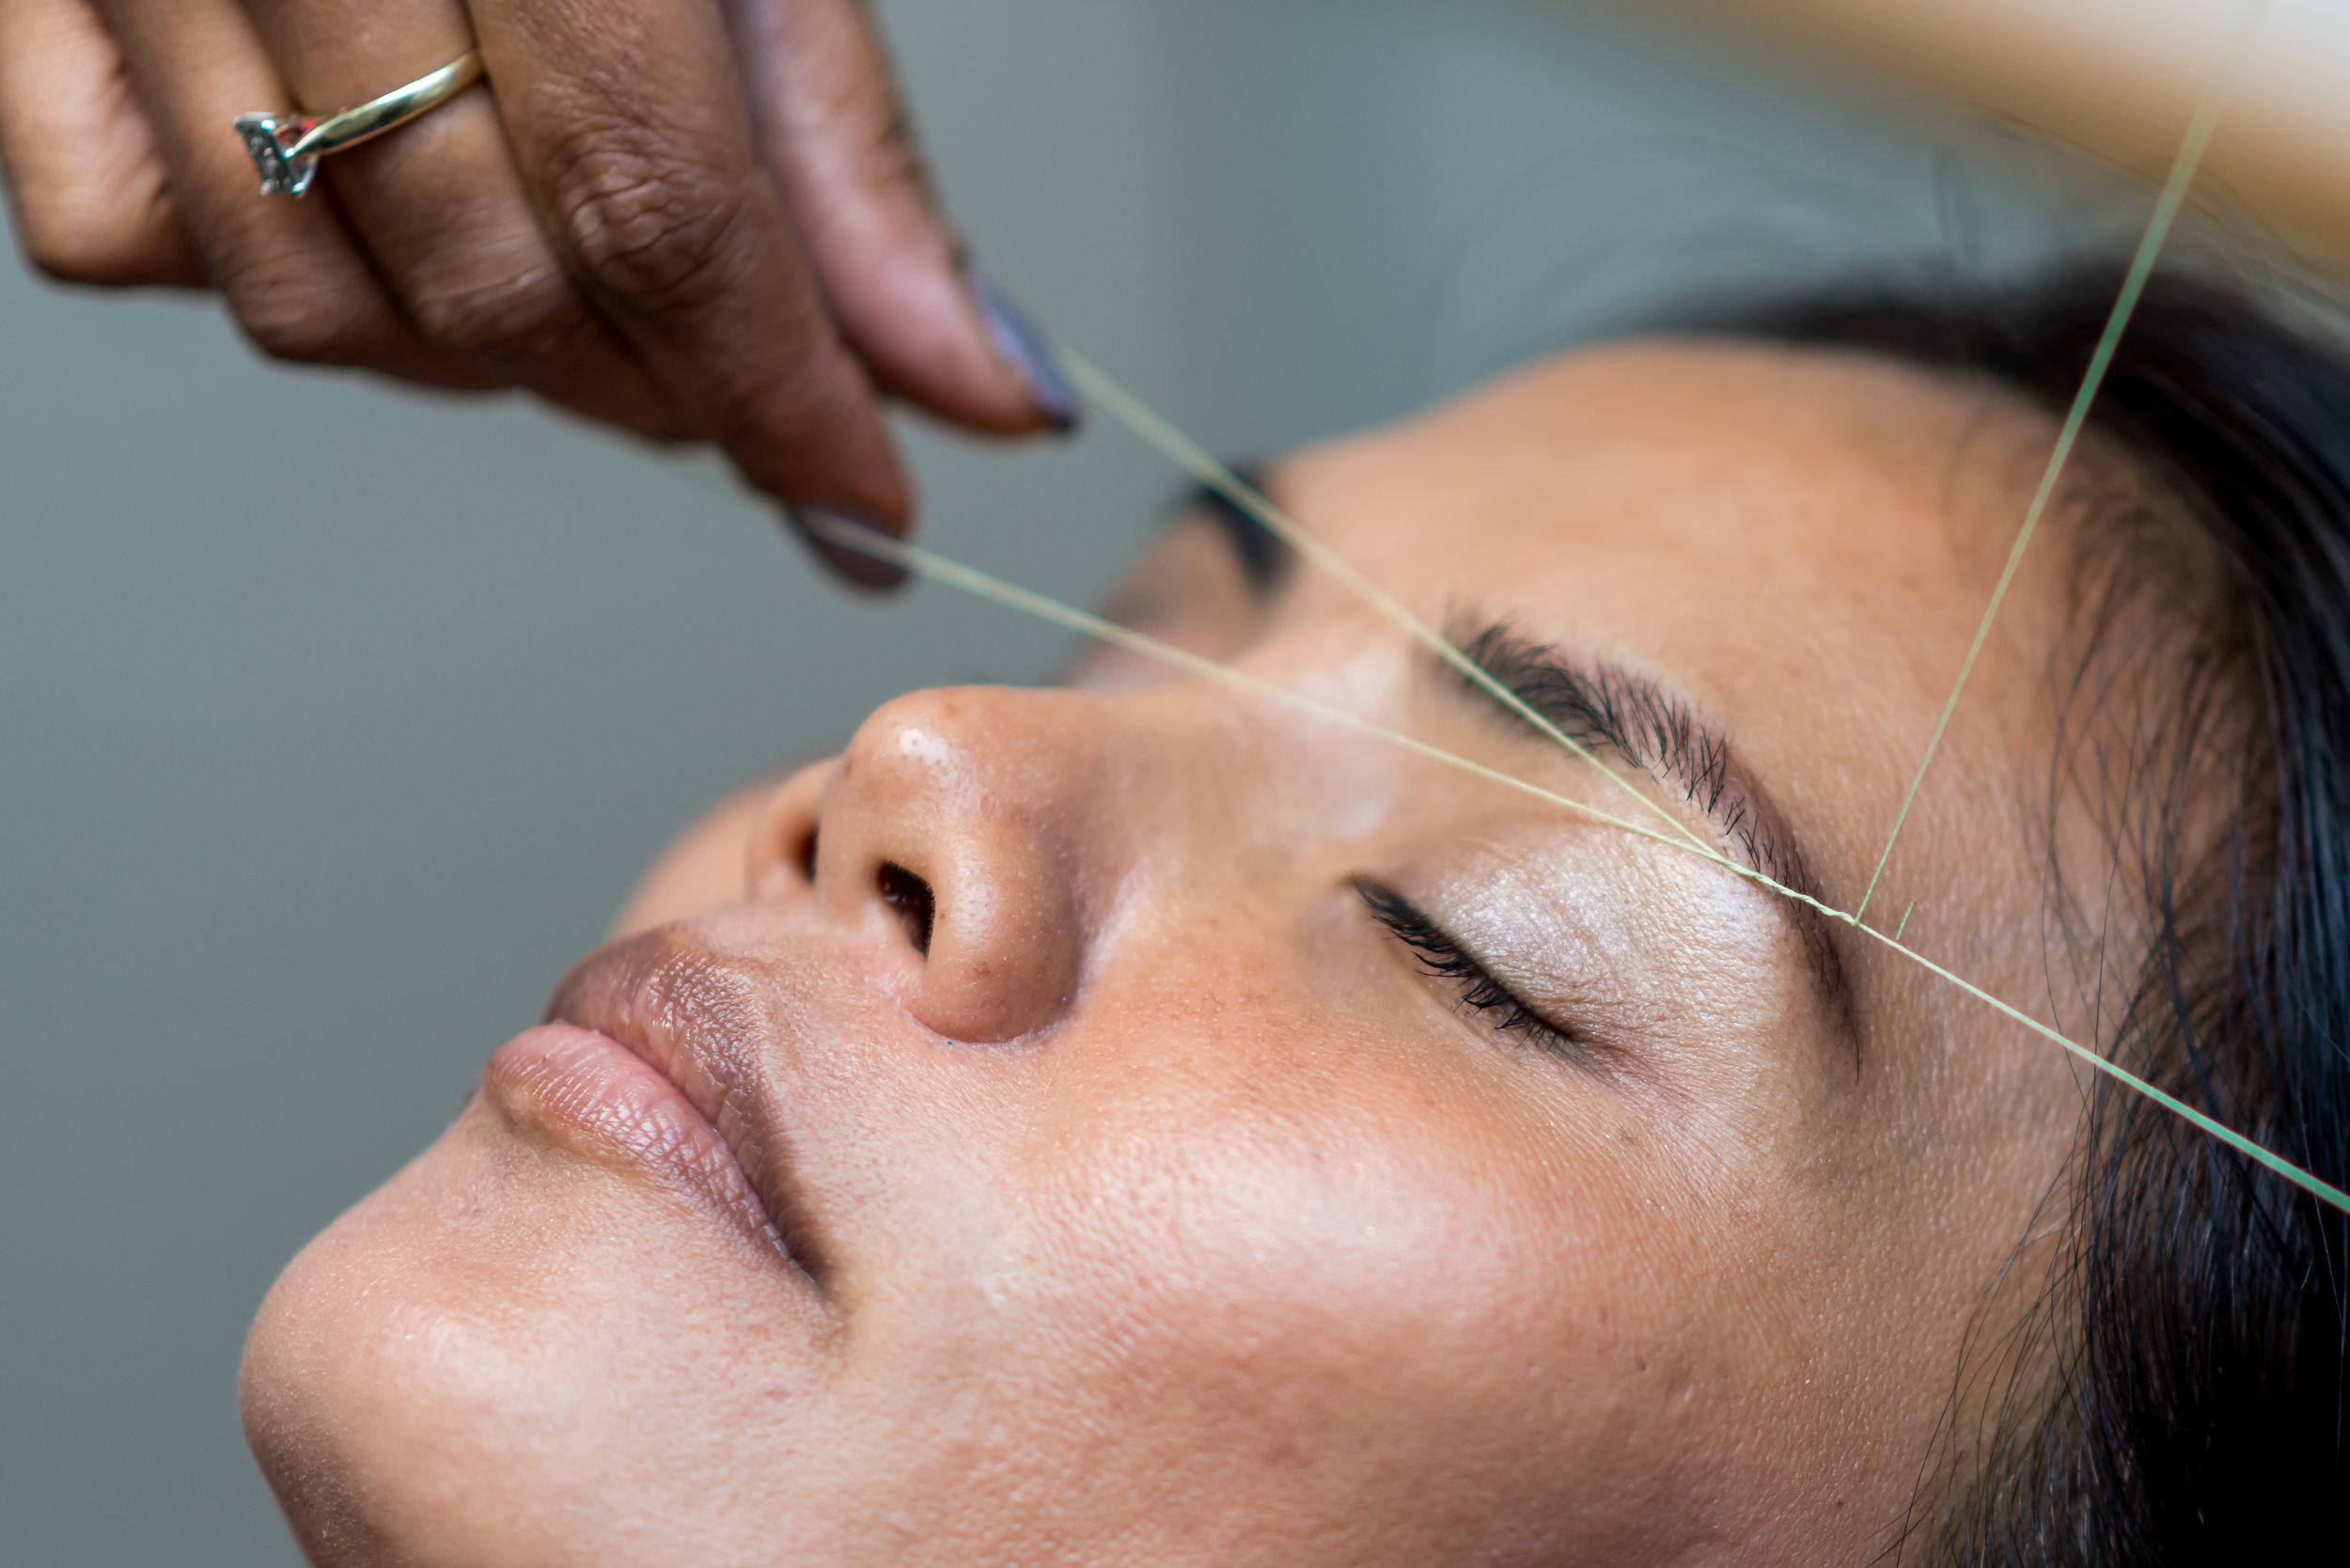 Threading Hair Removal - Upper lip or Chin (15 min)......$11.00Eyebrows (15 min)....................$16.00Full Face (30 min)....................$36.00